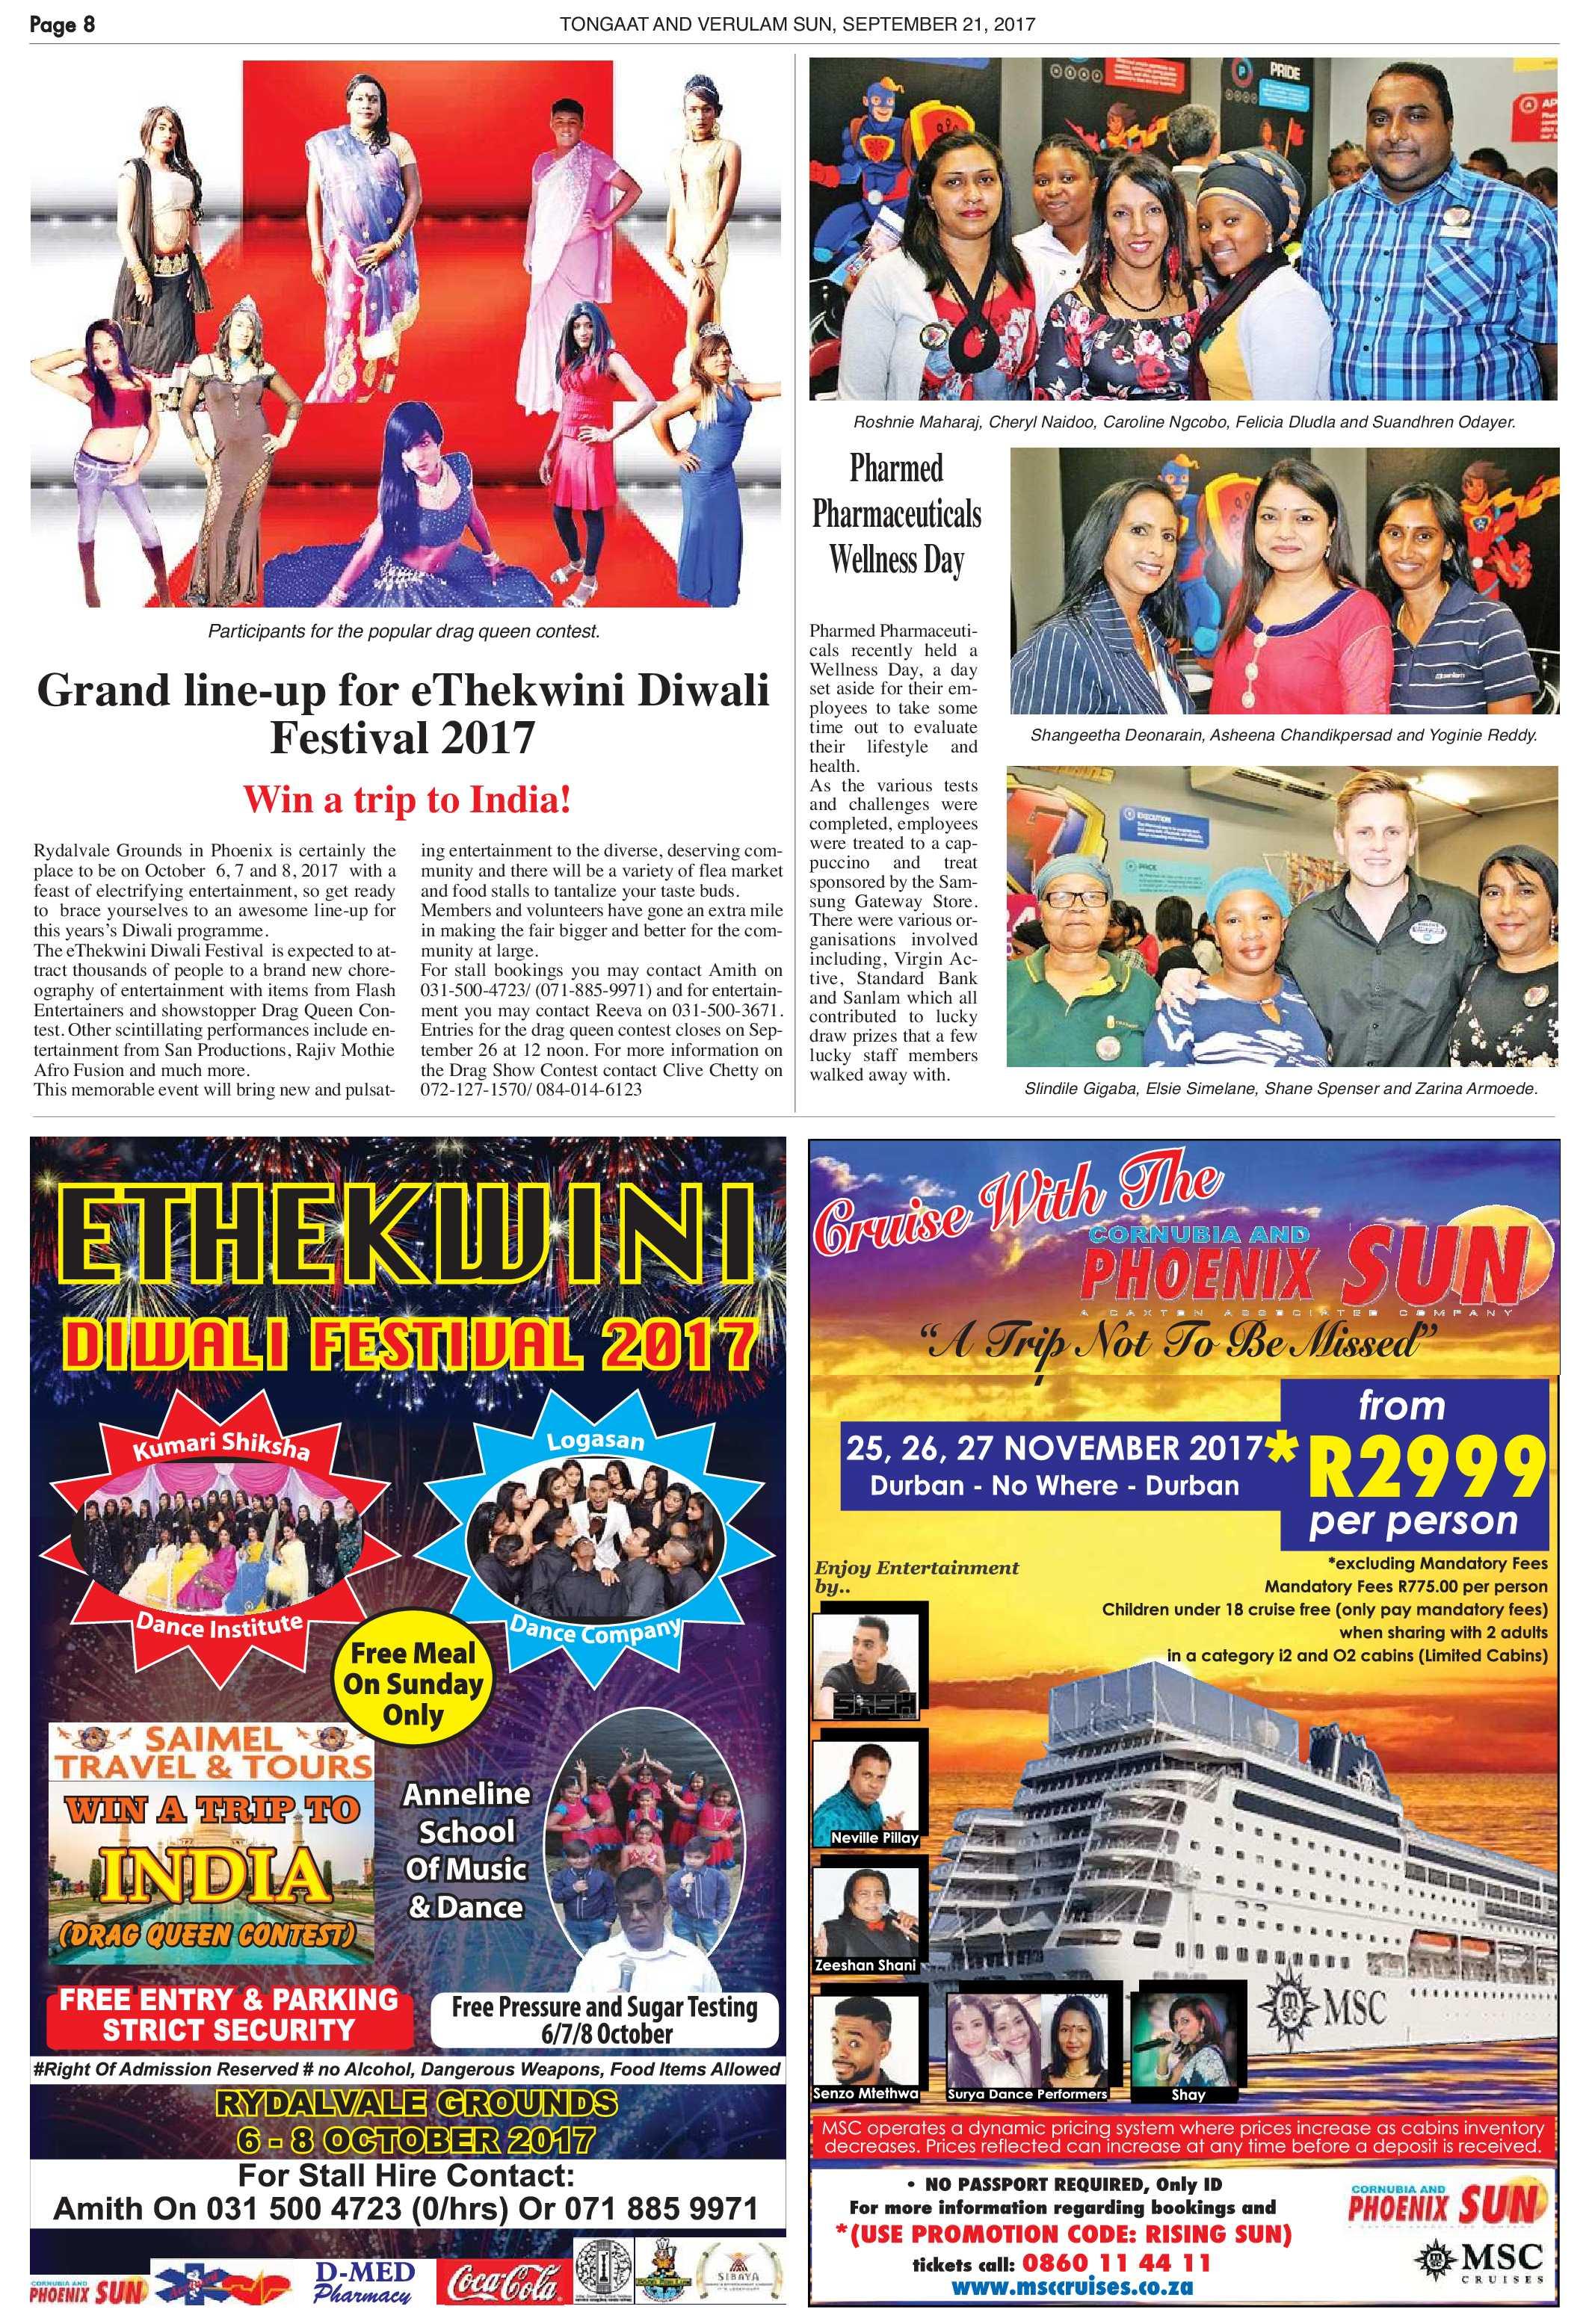 tongaat-verulam-sun-september-21-epapers-page-8